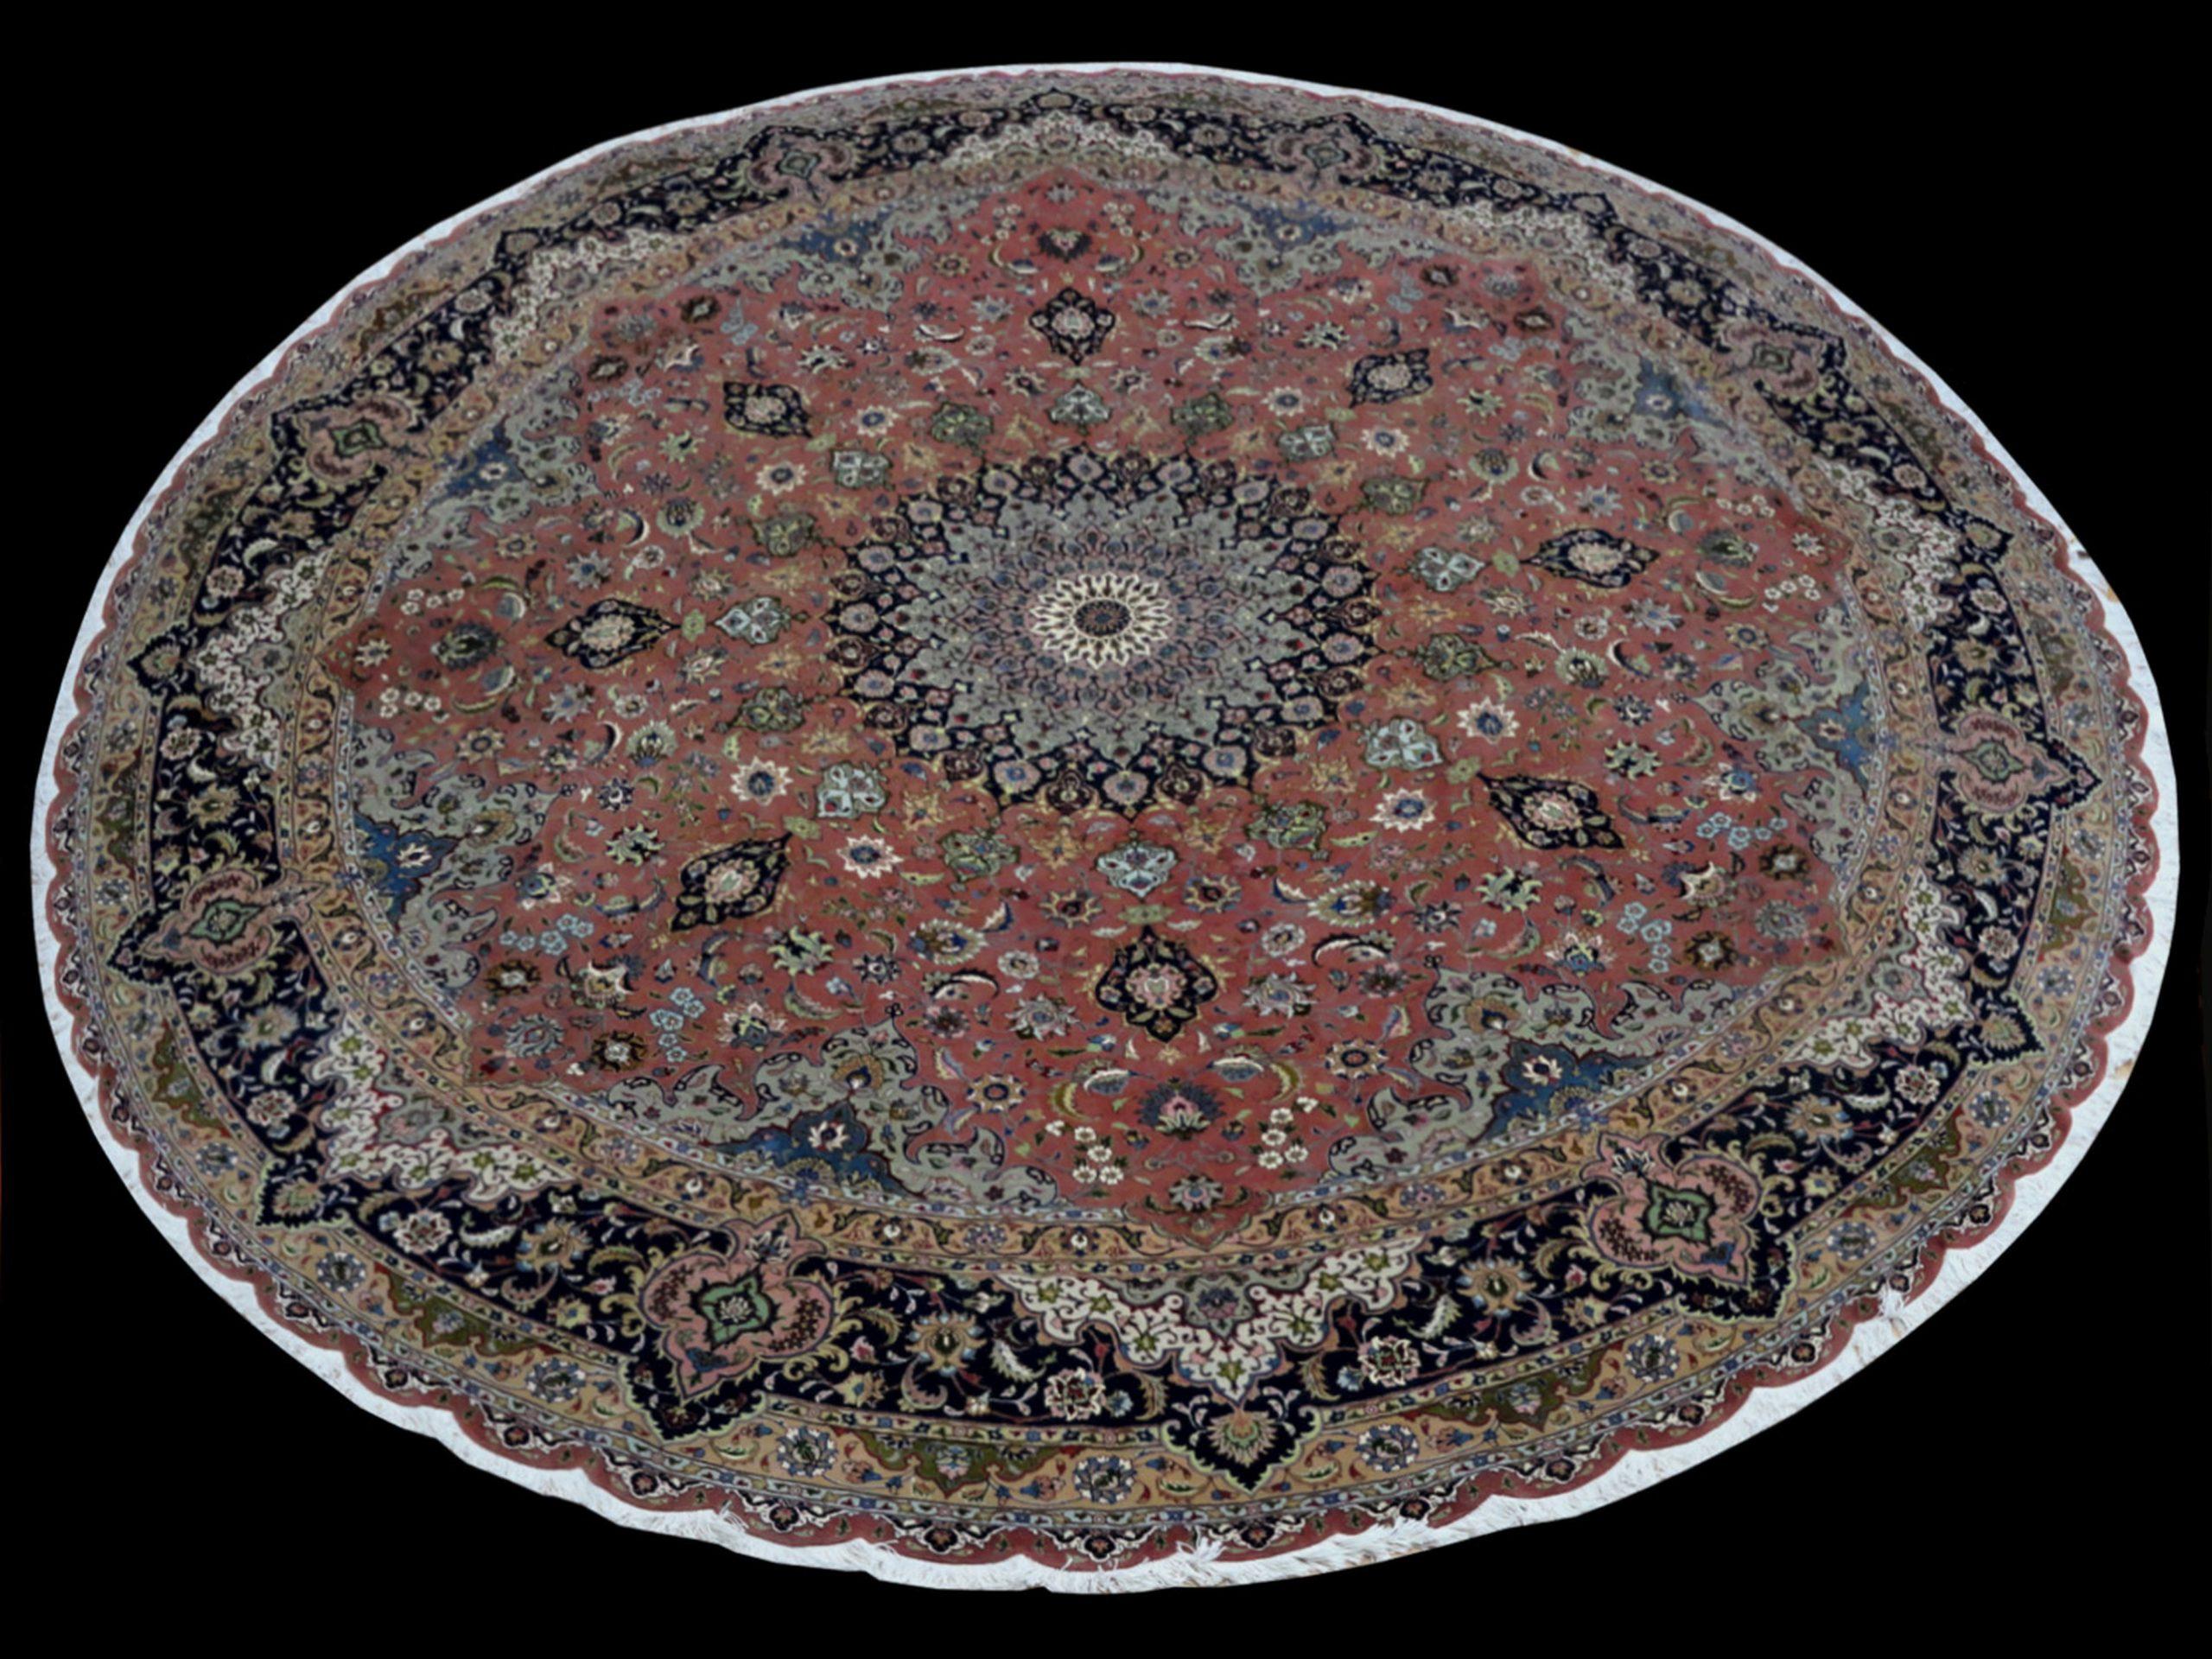 TRG 20816 PERSIAN TABRIZ 13 X 13